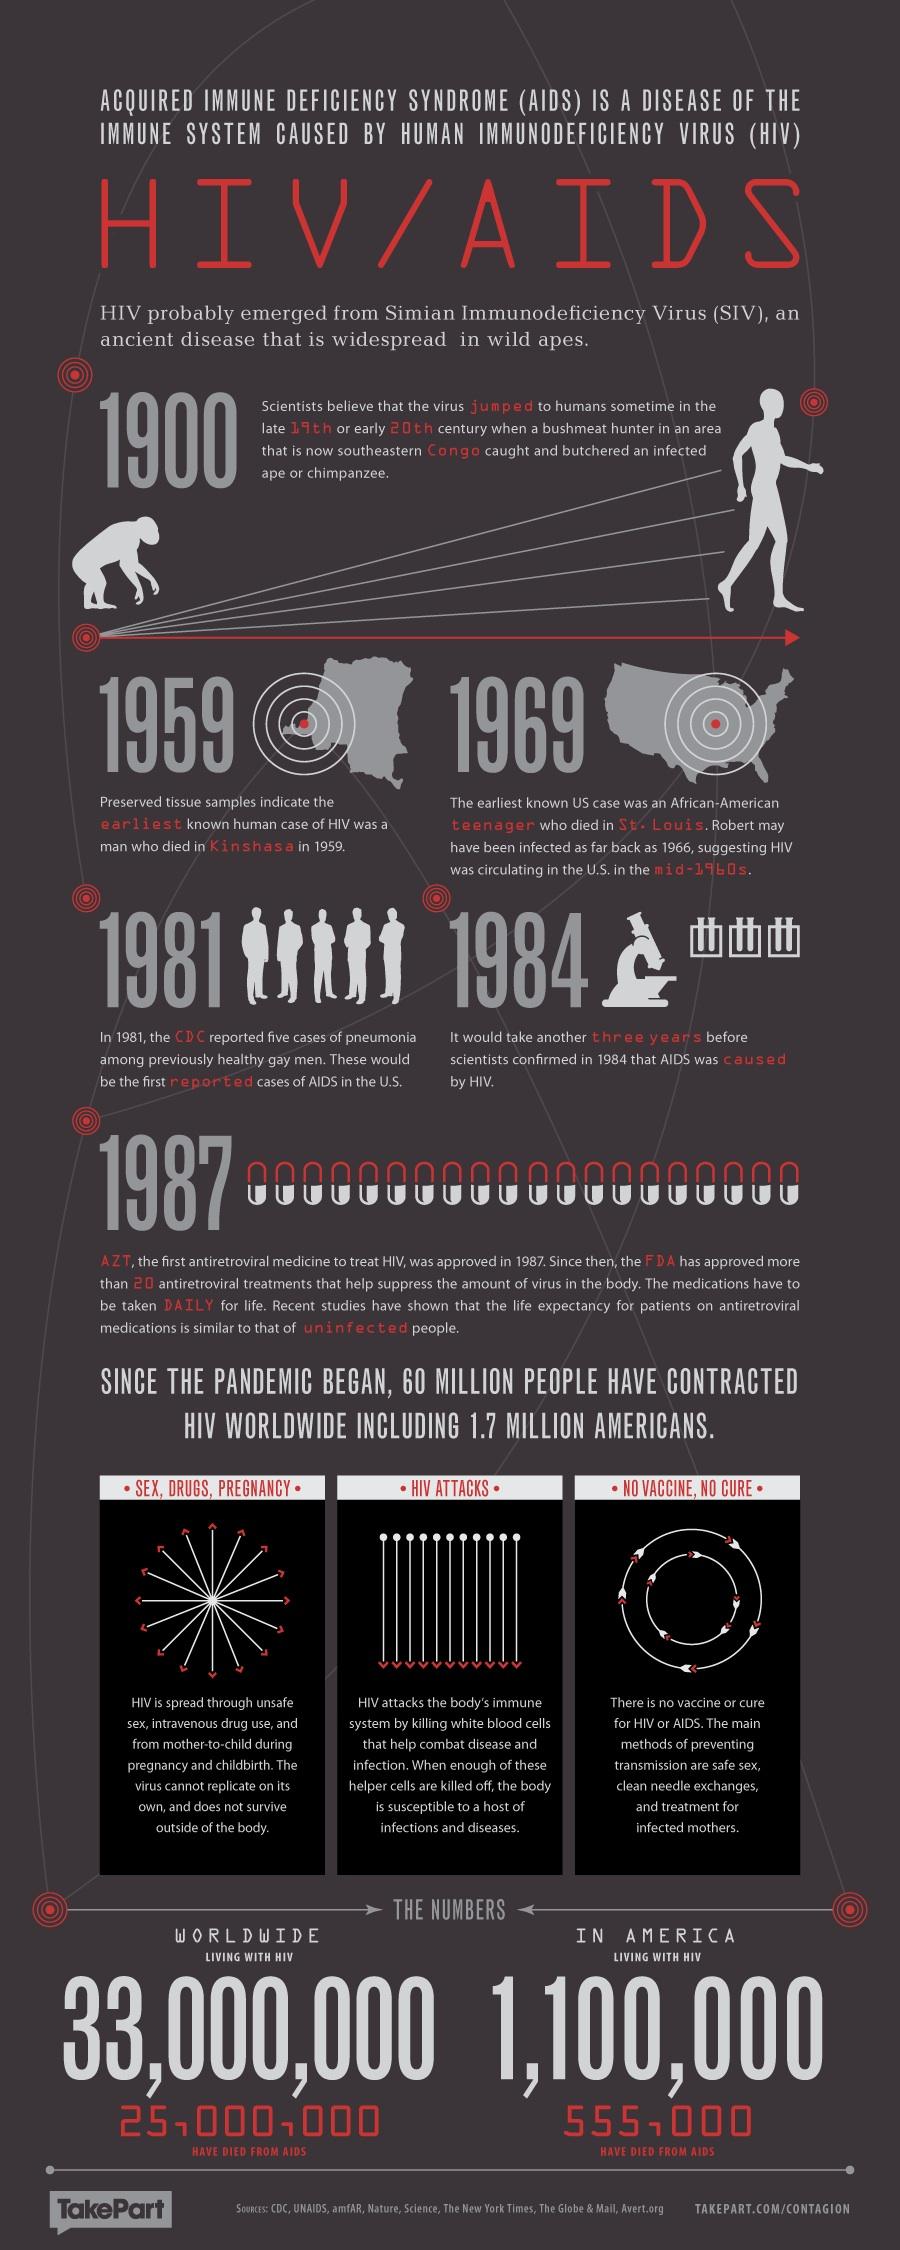 aids-graphic-jpg.jpg